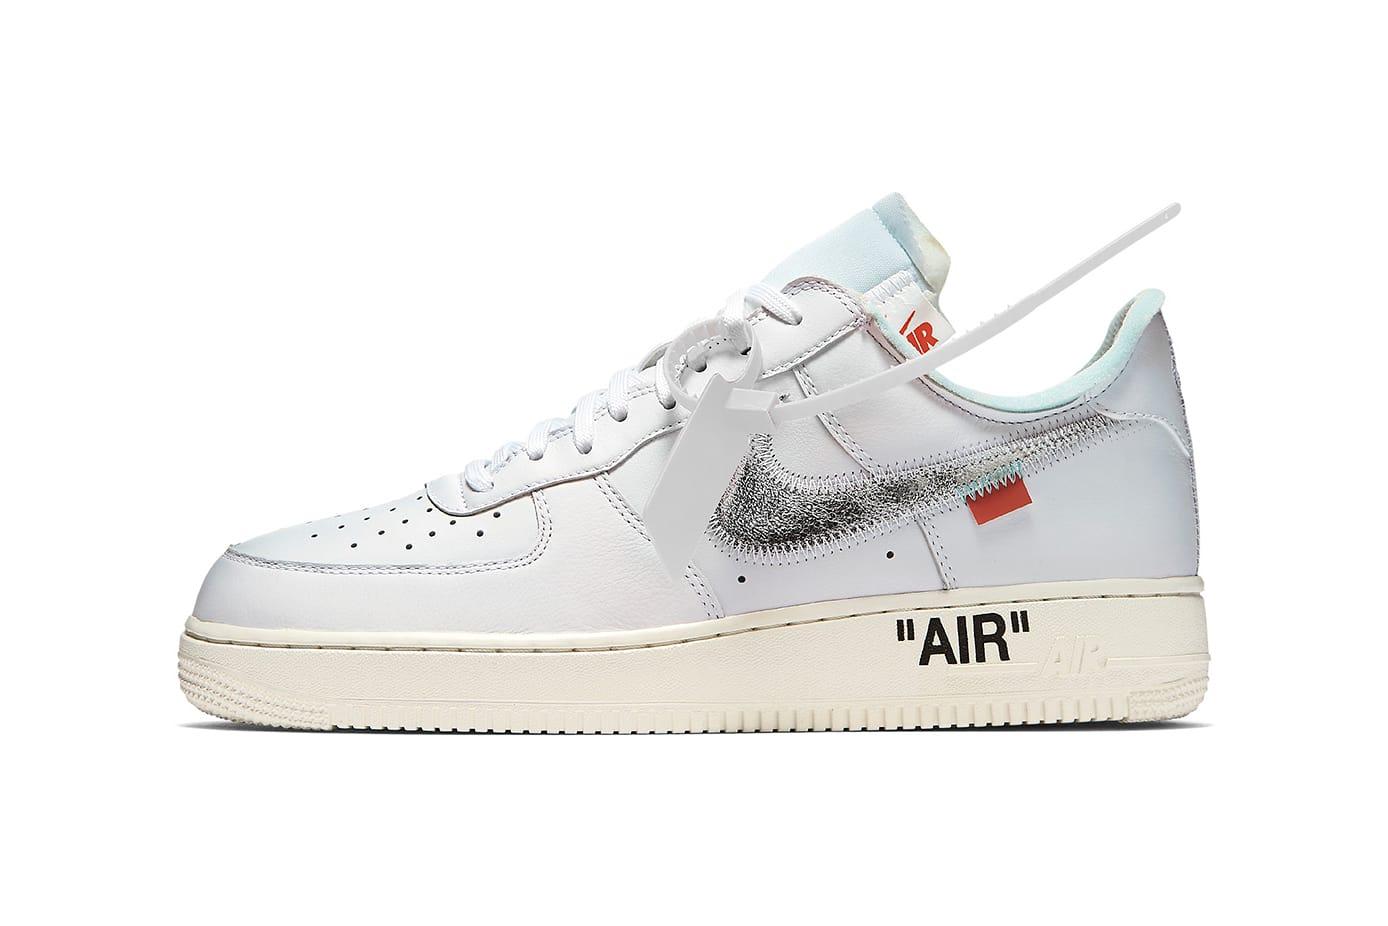 Virgil Abloh x Nike Air Force 1 White